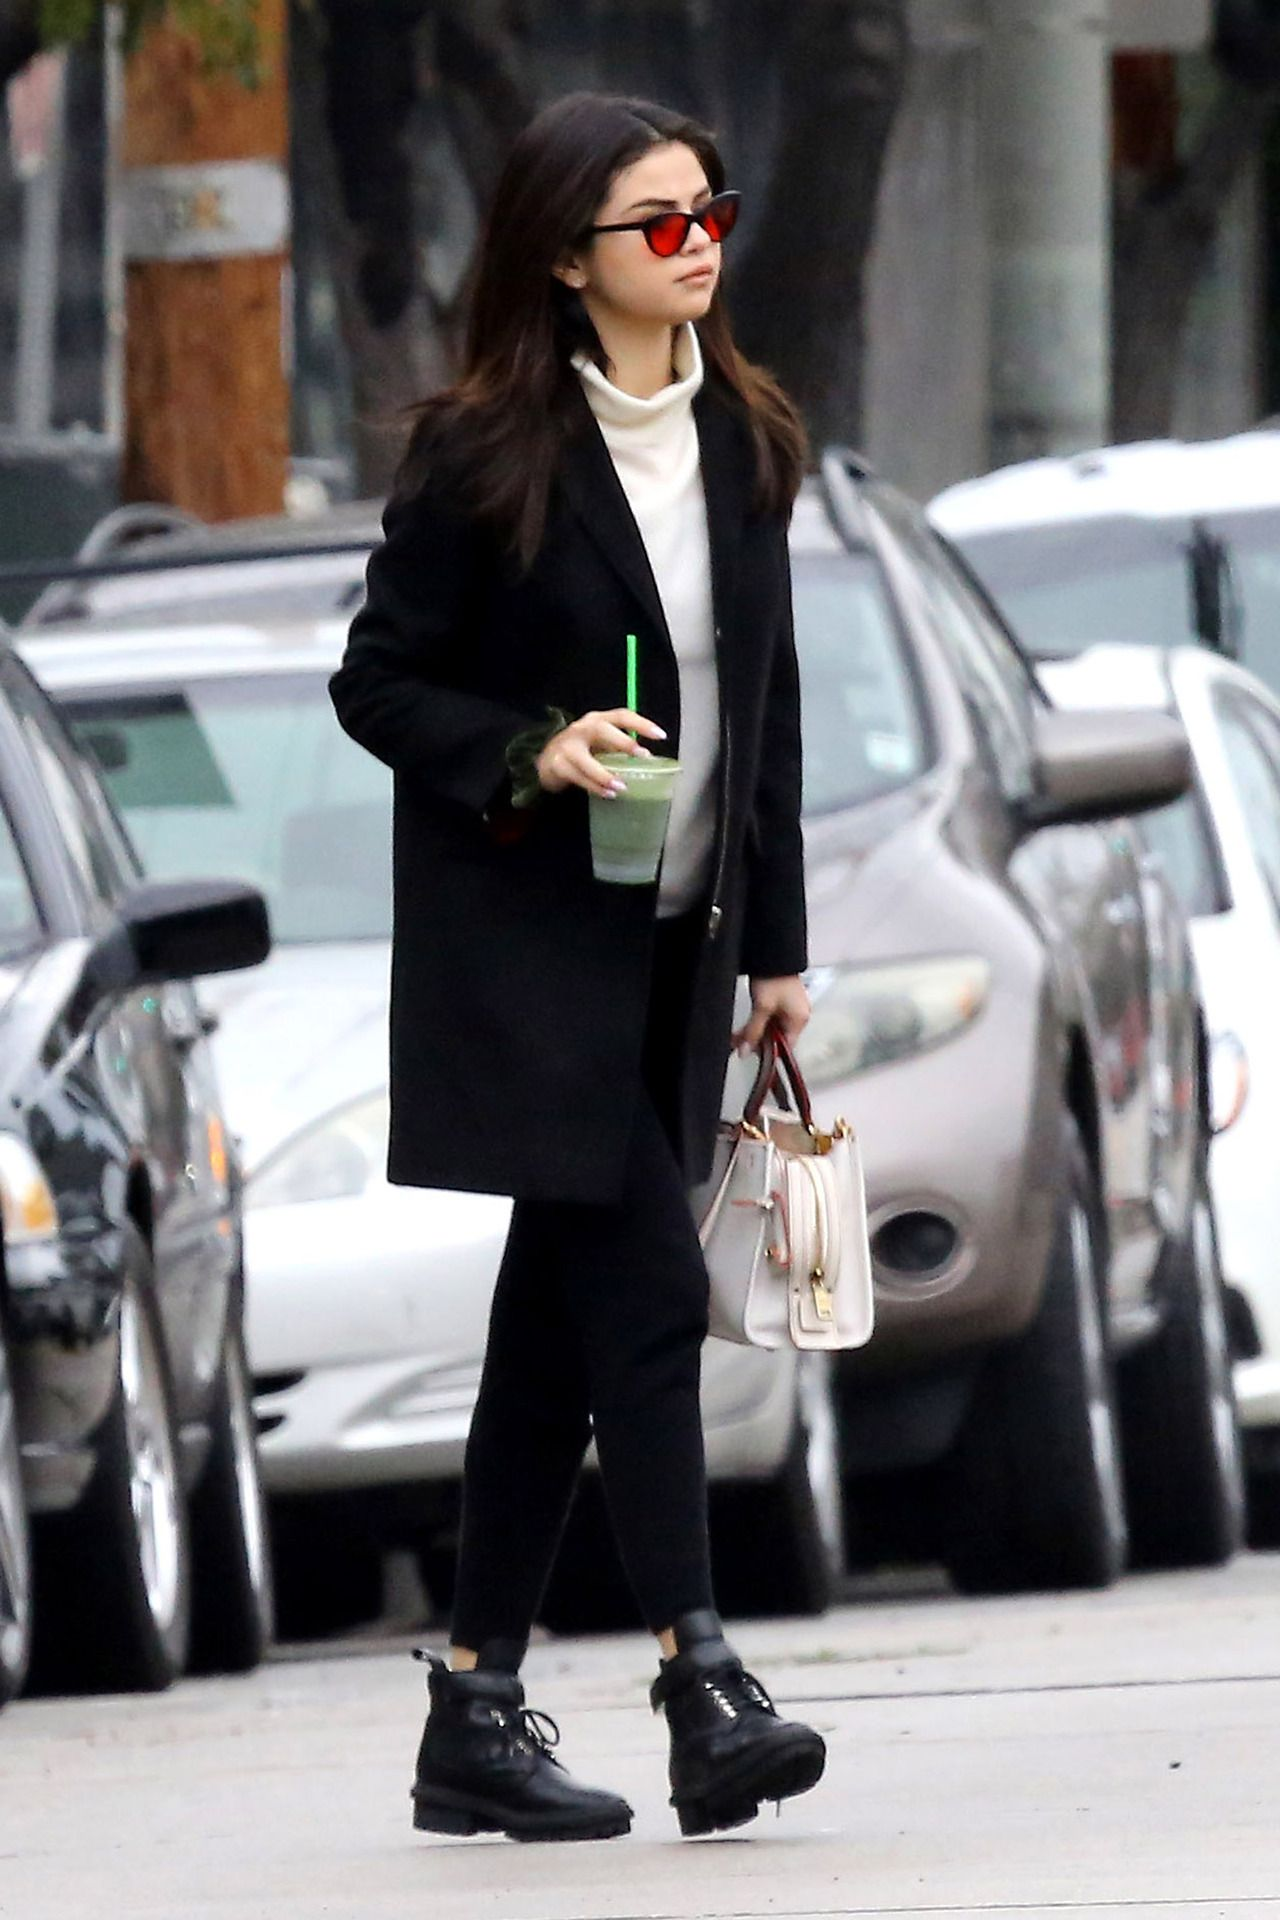 Selena Gomez Sokak Stilini Keşfedin